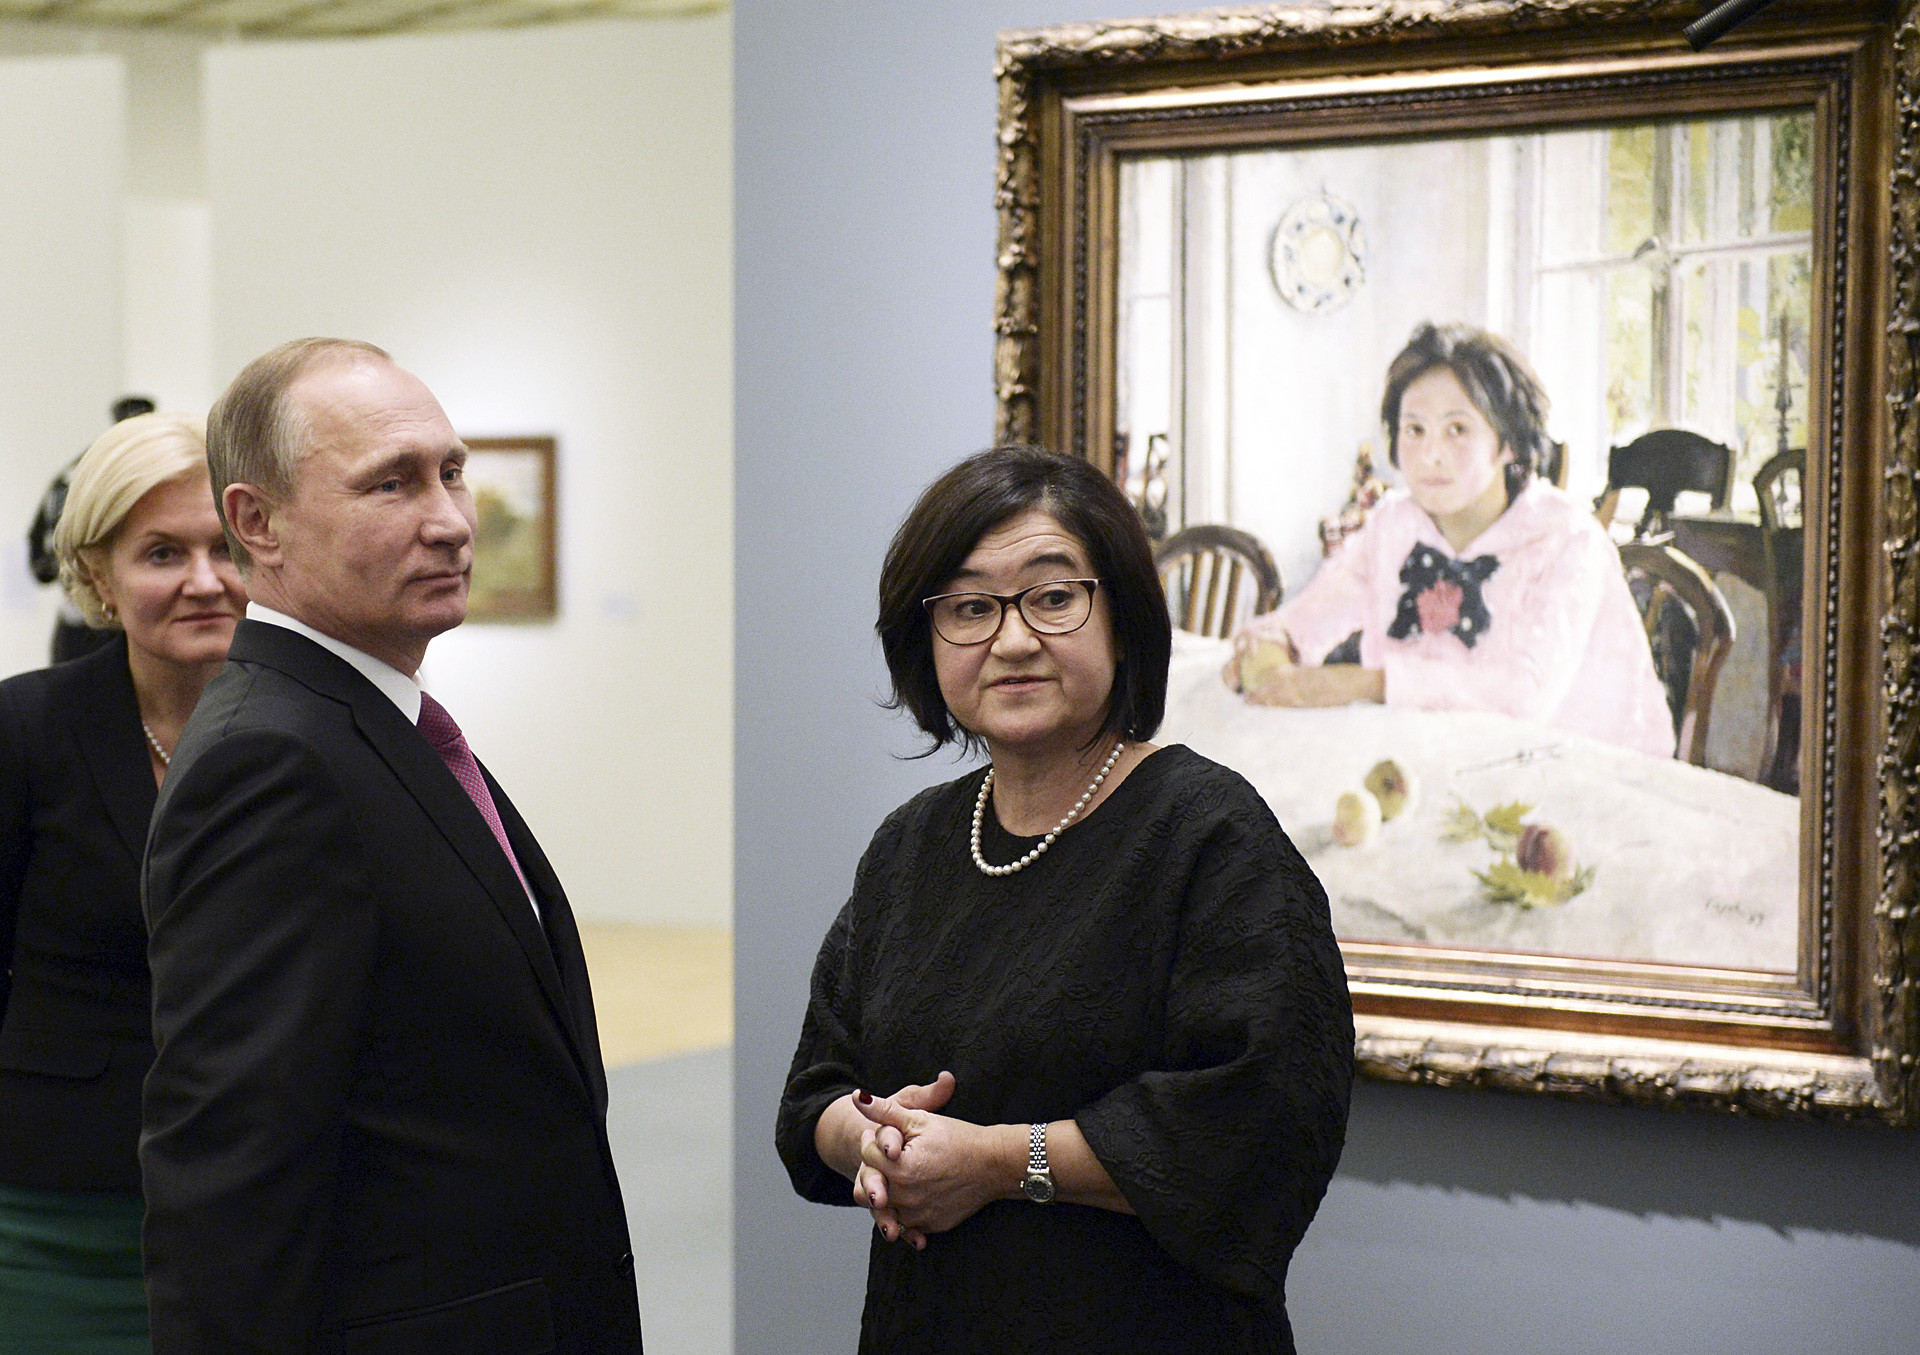 Vladimir Putin listens to director of the State Tretyakov Gallery Zelfira Tregulova as he visits an exhibition of artist Valentin Serov.